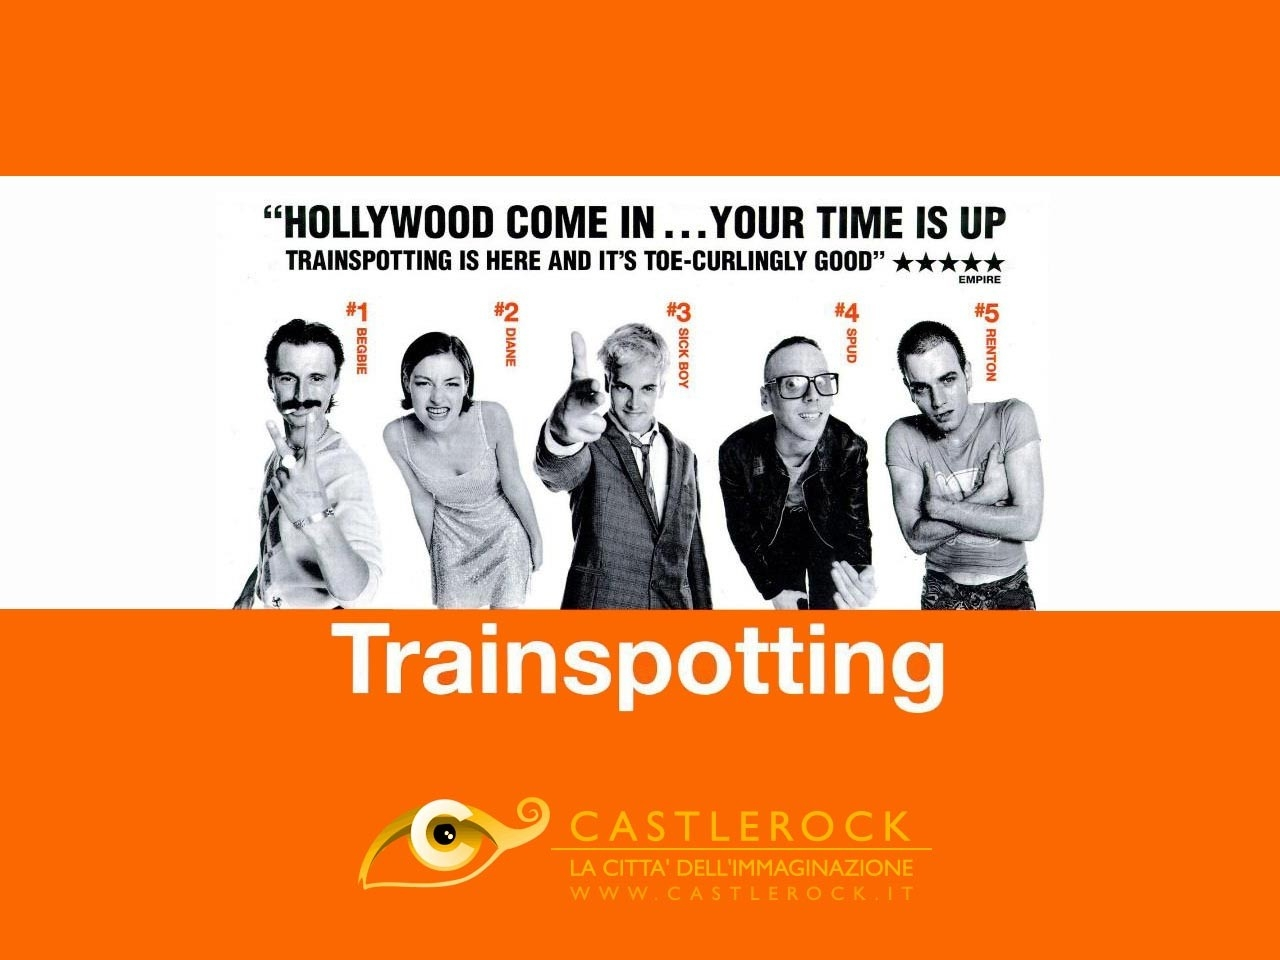 Wallpaper del film Trainspotting